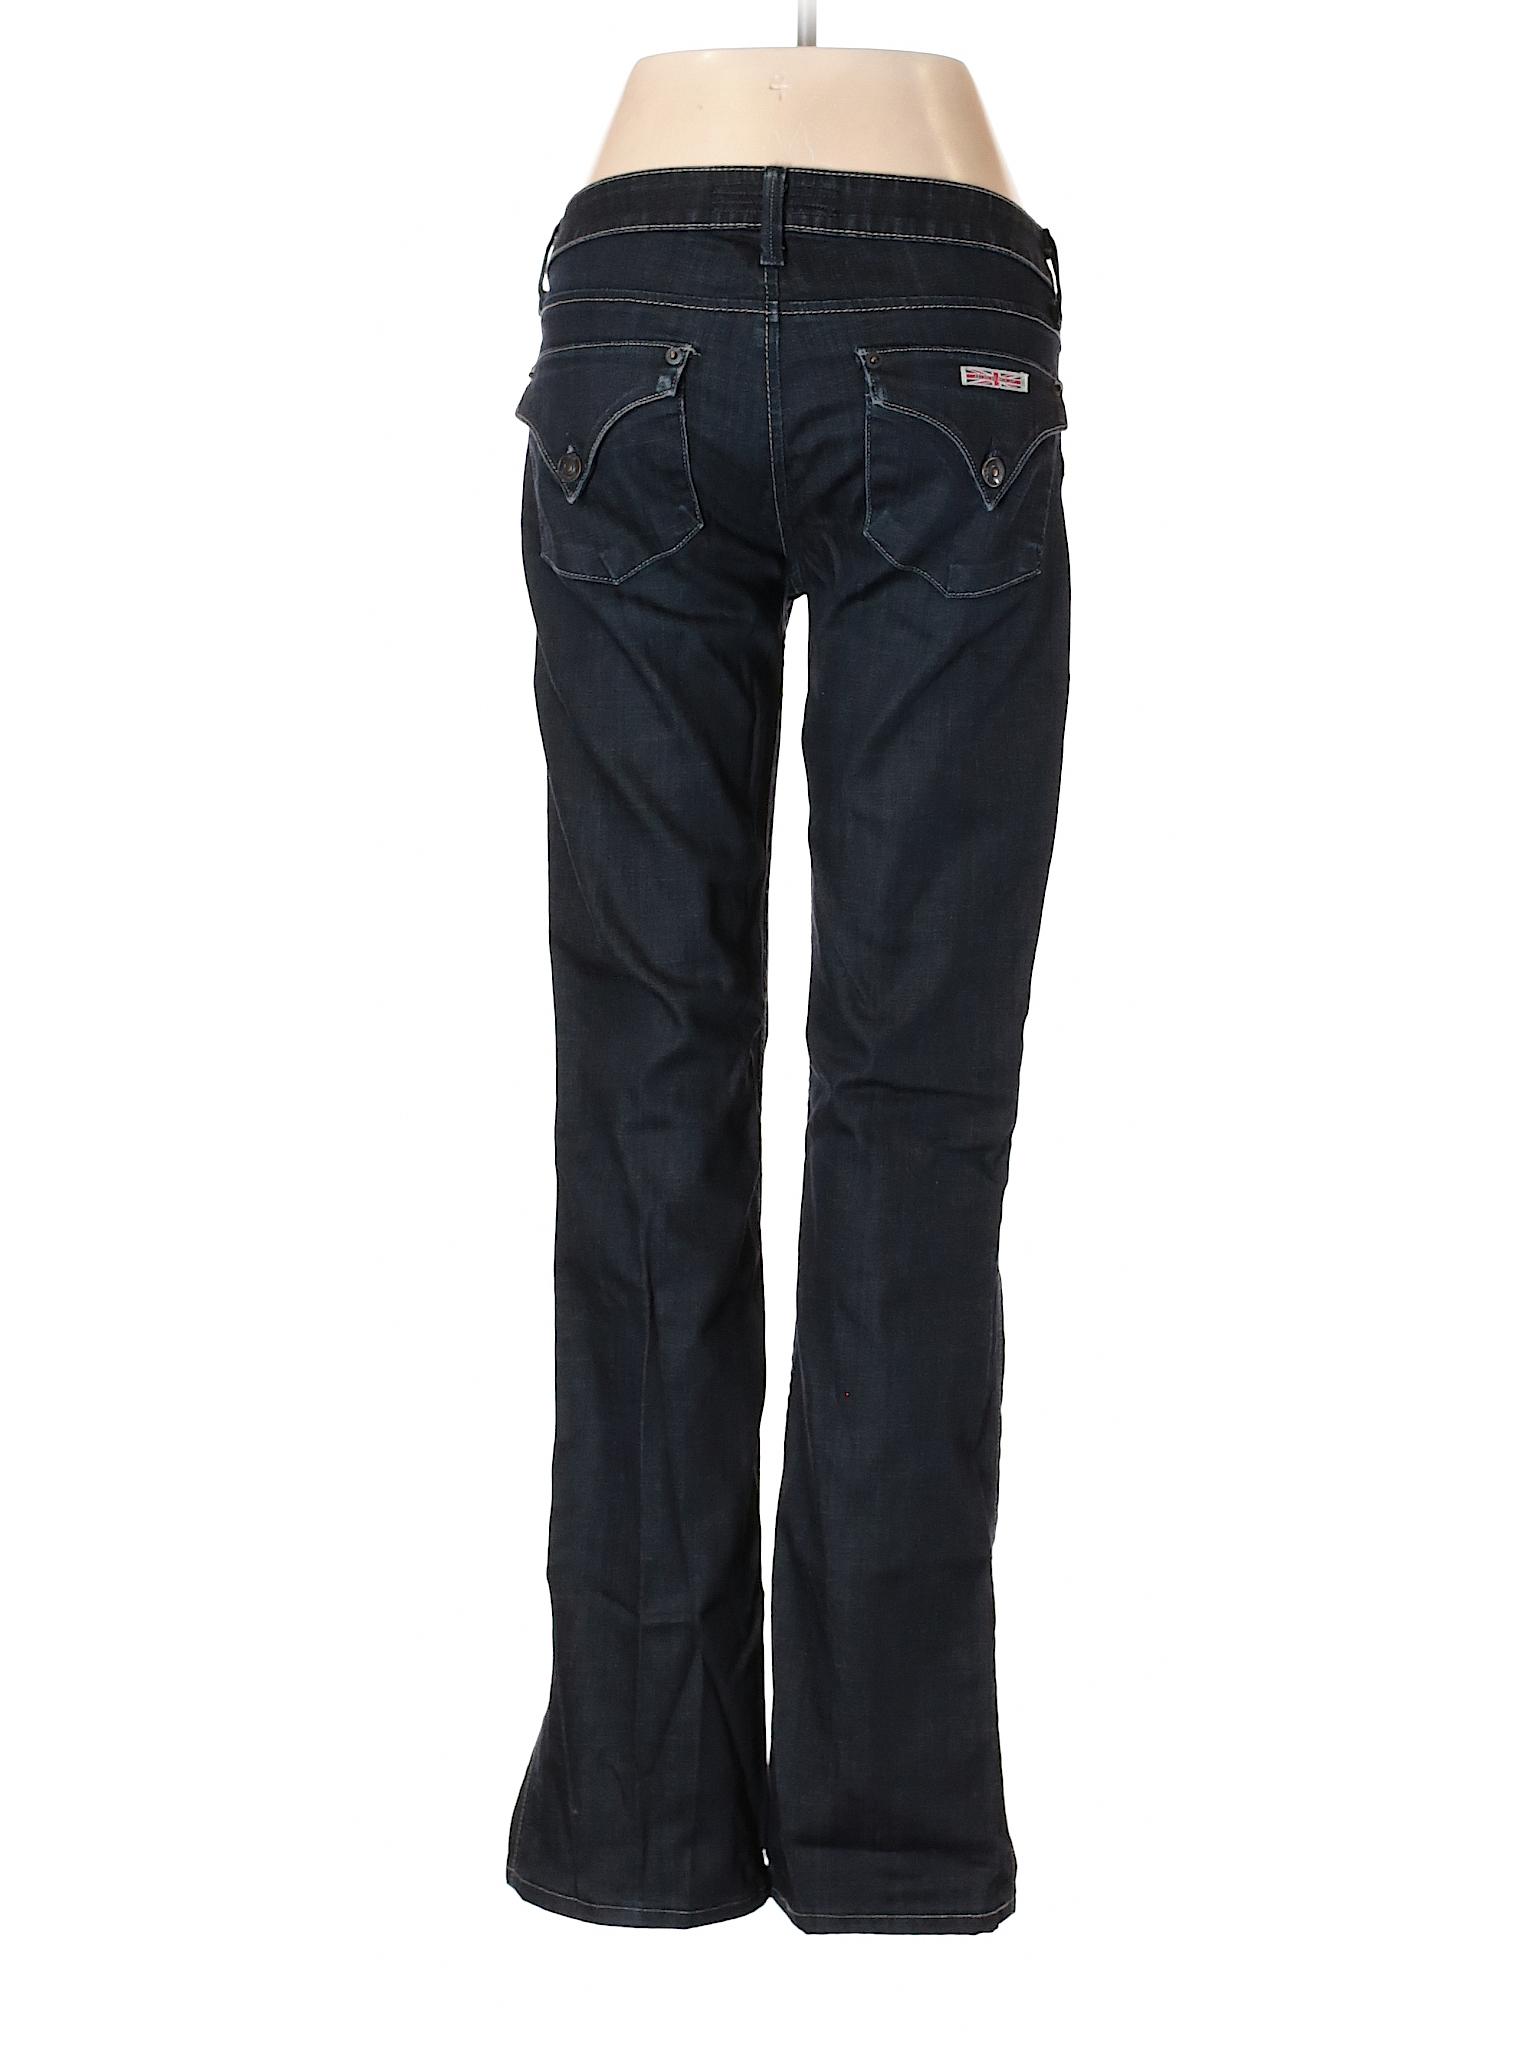 Promotion Jeans Jeans Hudson Promotion Promotion Jeans Hudson Promotion Jeans Hudson Hudson Rdz004qW